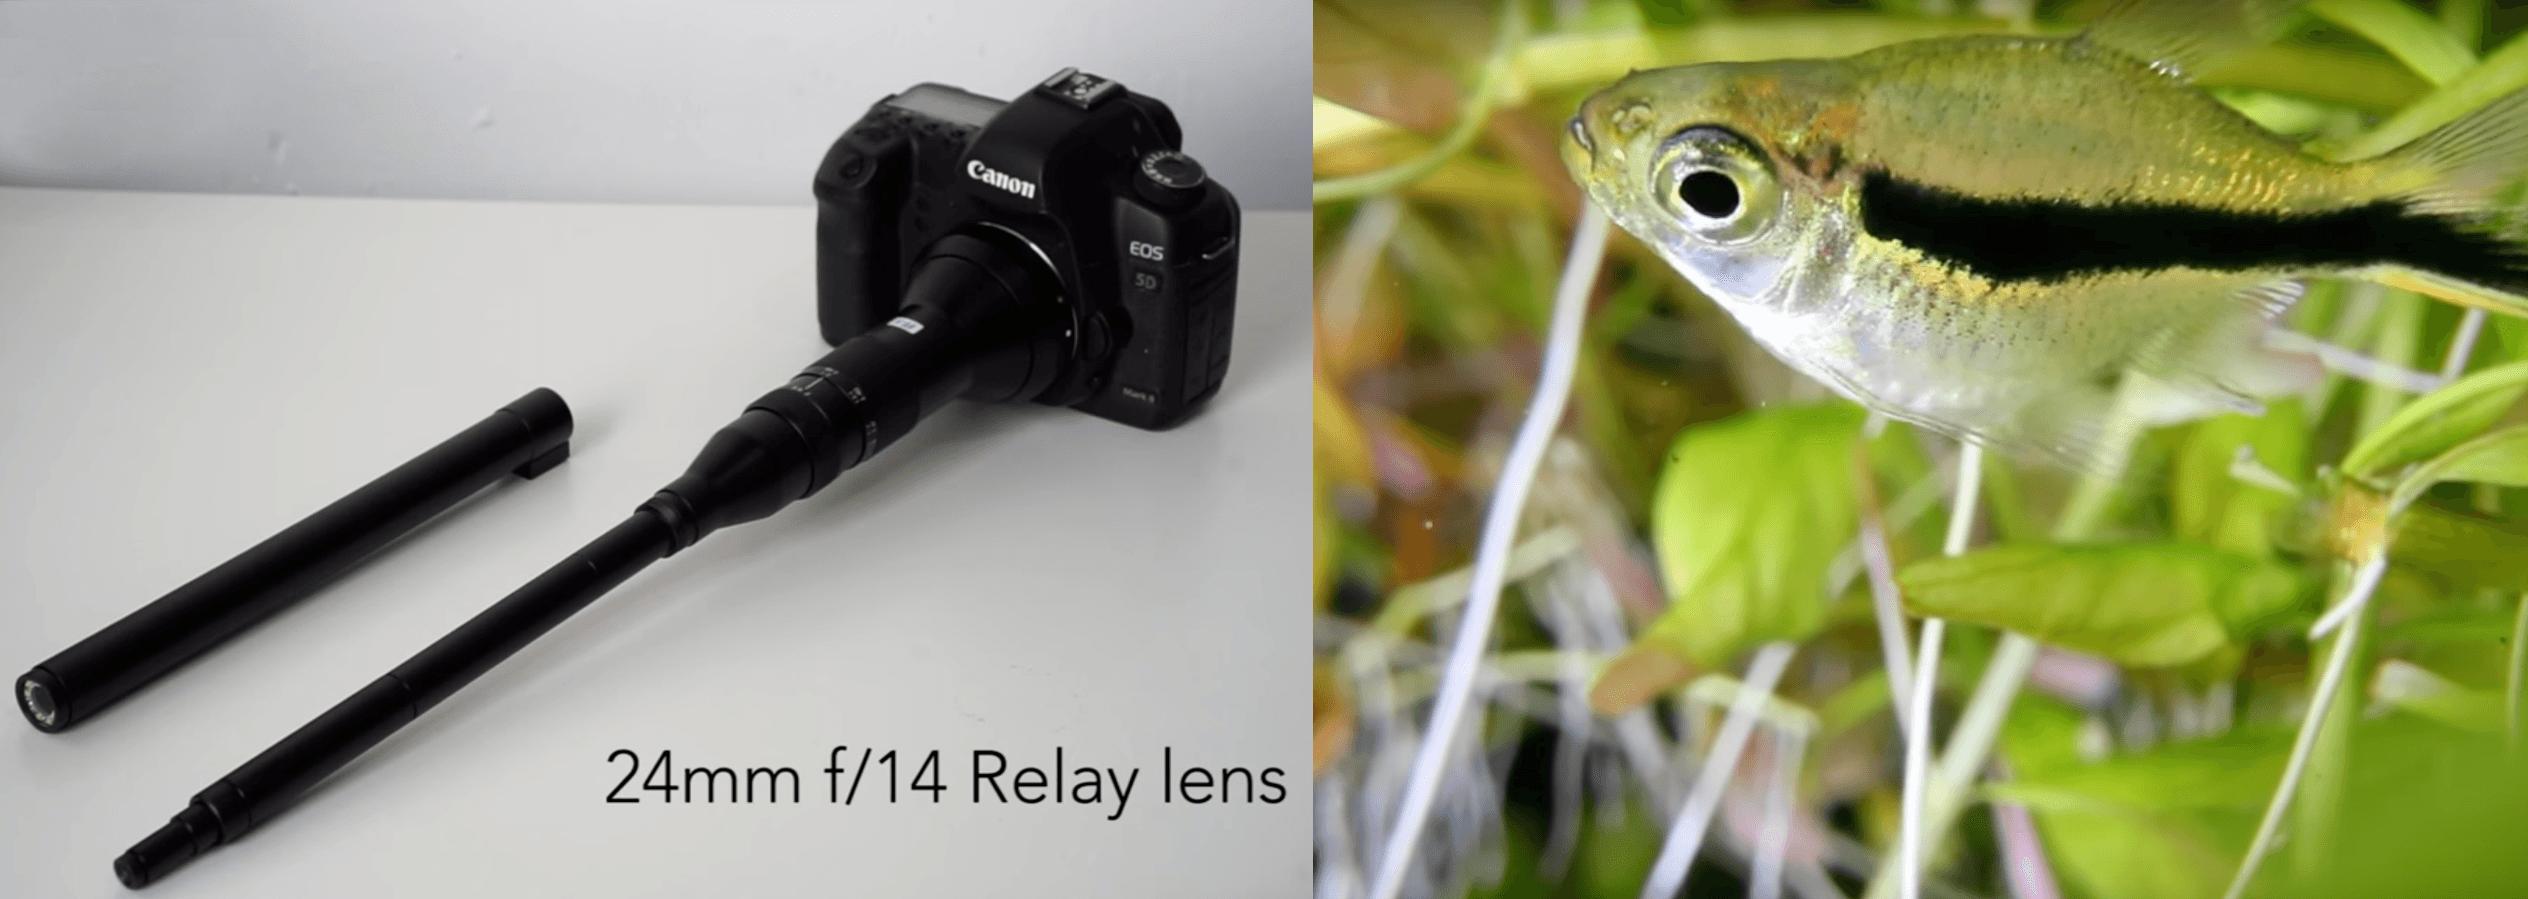 Sample footage with weirdest lens ever: Laowa 24mm f/14 telescopic macro  lens - DIY Photography